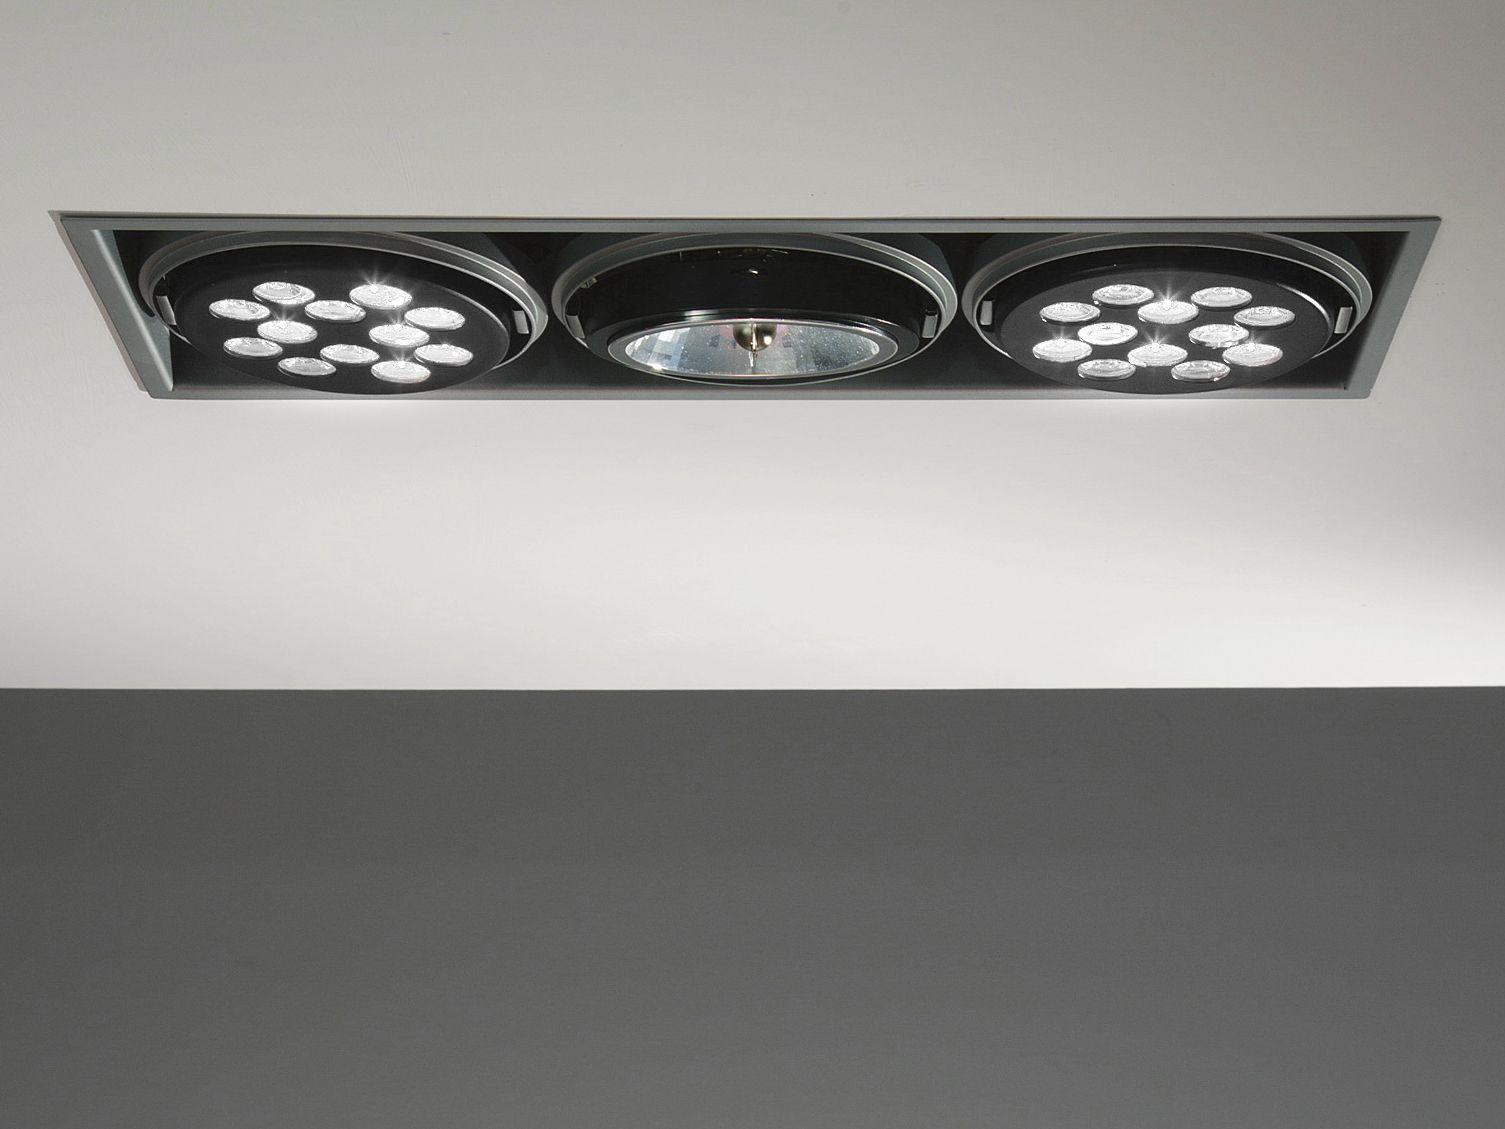 halogeno led techo baño - Buscar con Google   Inspirational ...